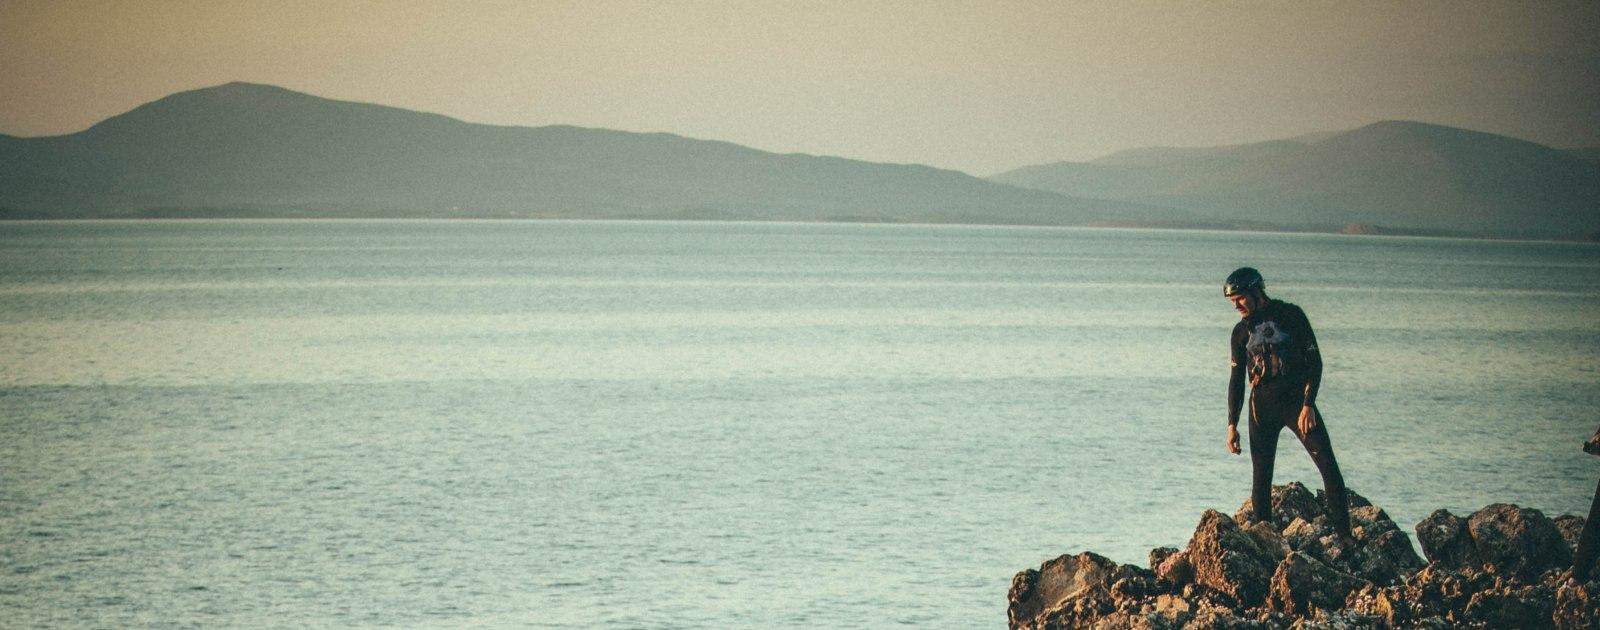 coasteering-banner